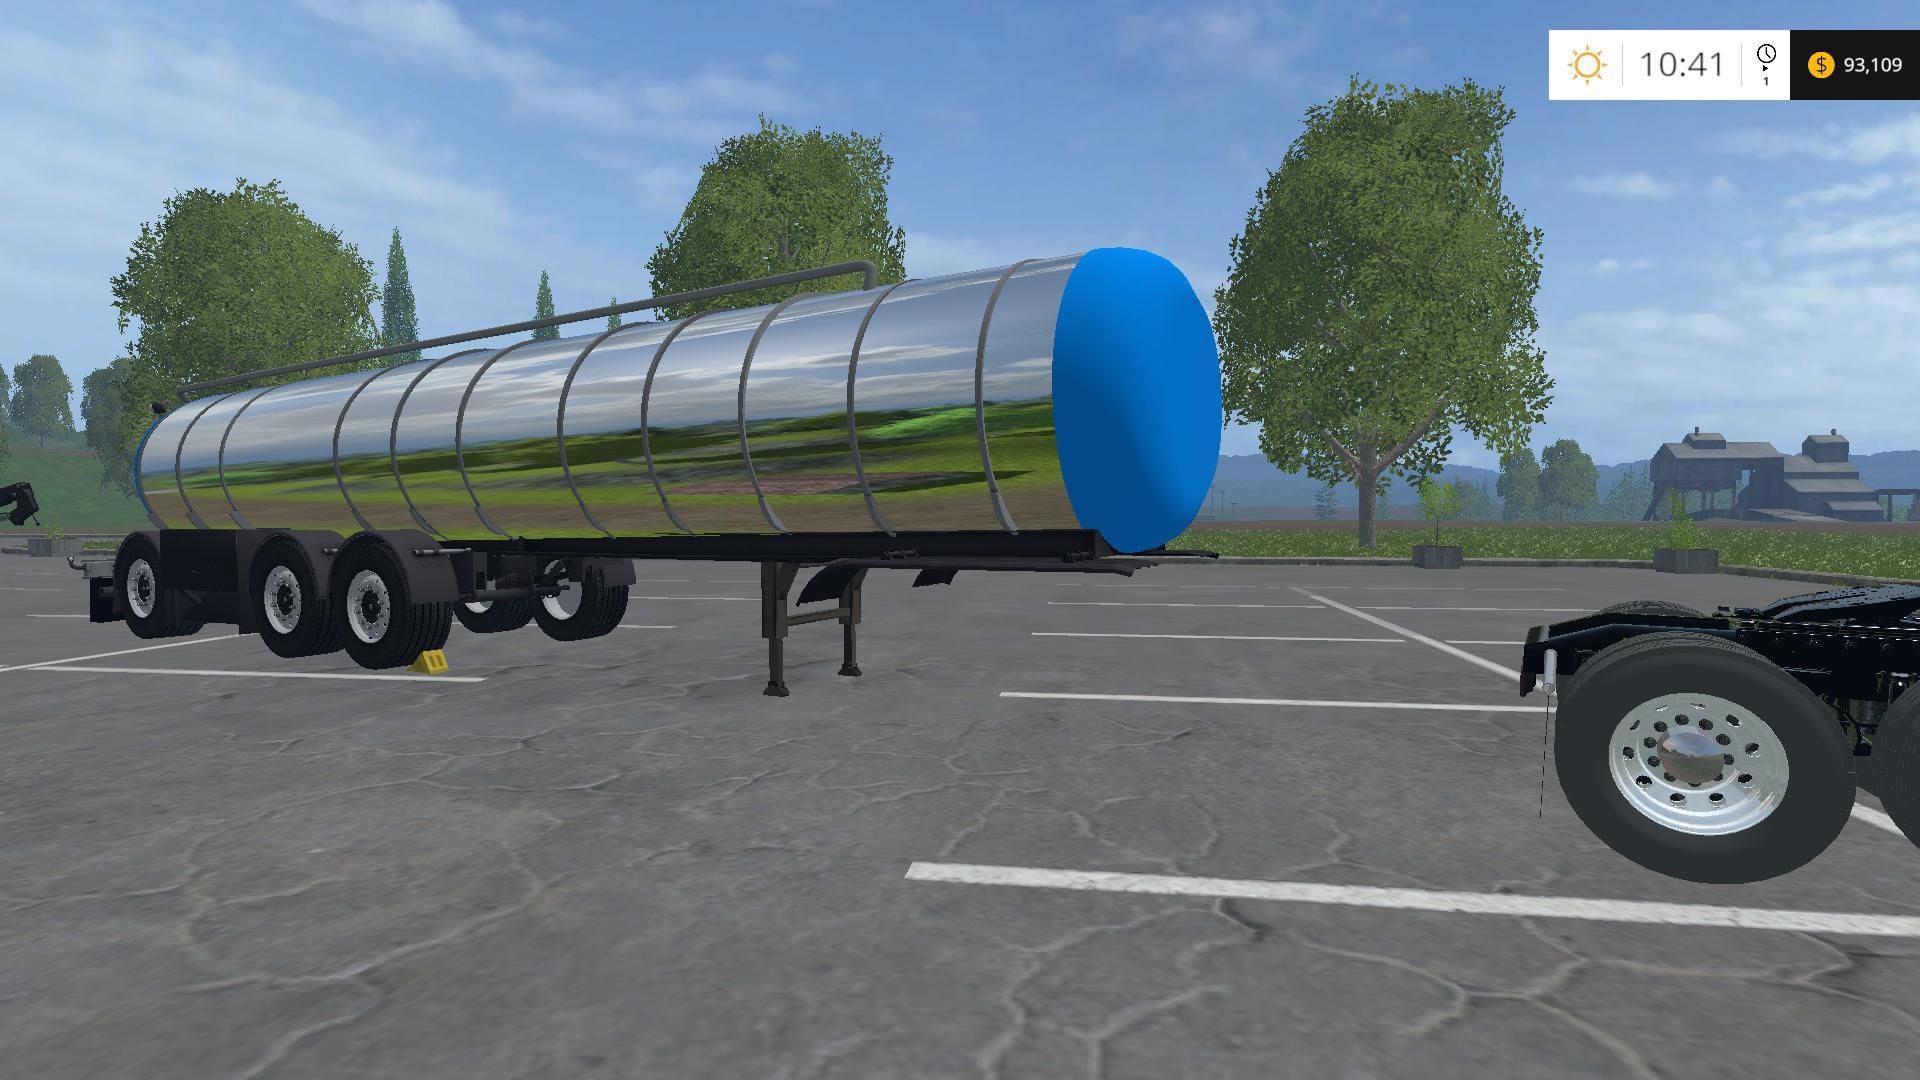 9545-vmt-tarn-liquid-manure-trailer-version-2_1